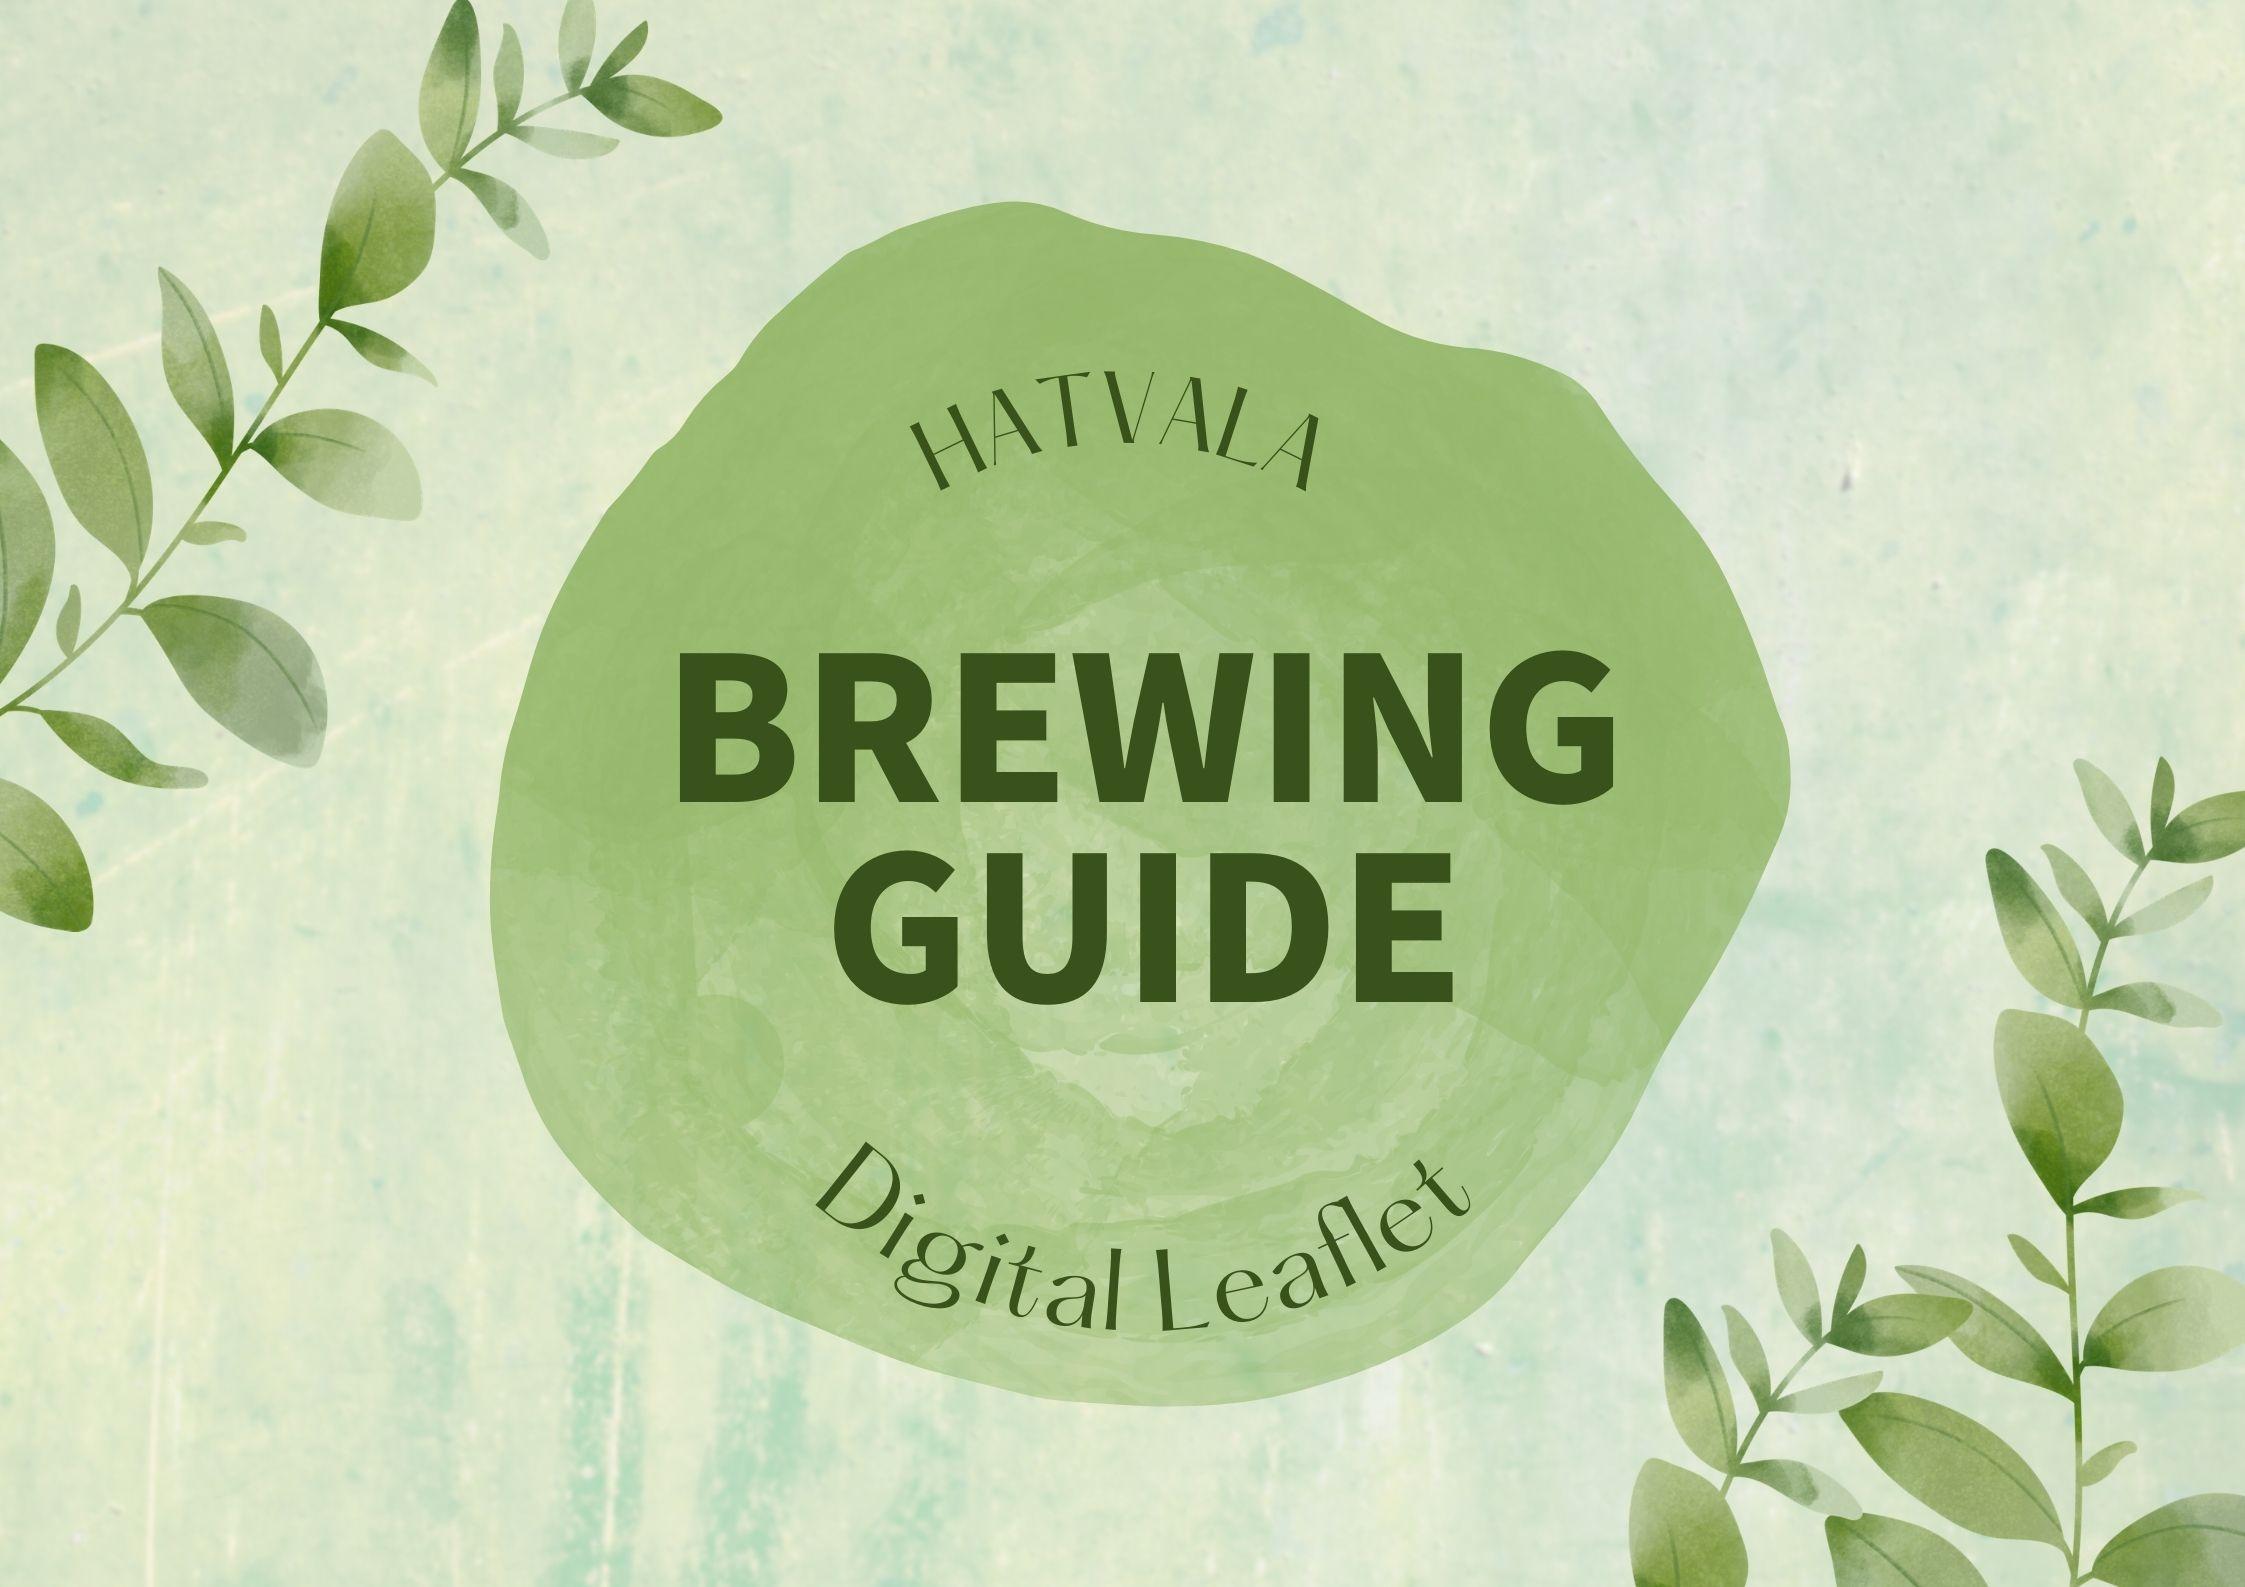 【Brewing Guide】HATVALA ハトヴァラ 茶葉のおいしい淹れ方